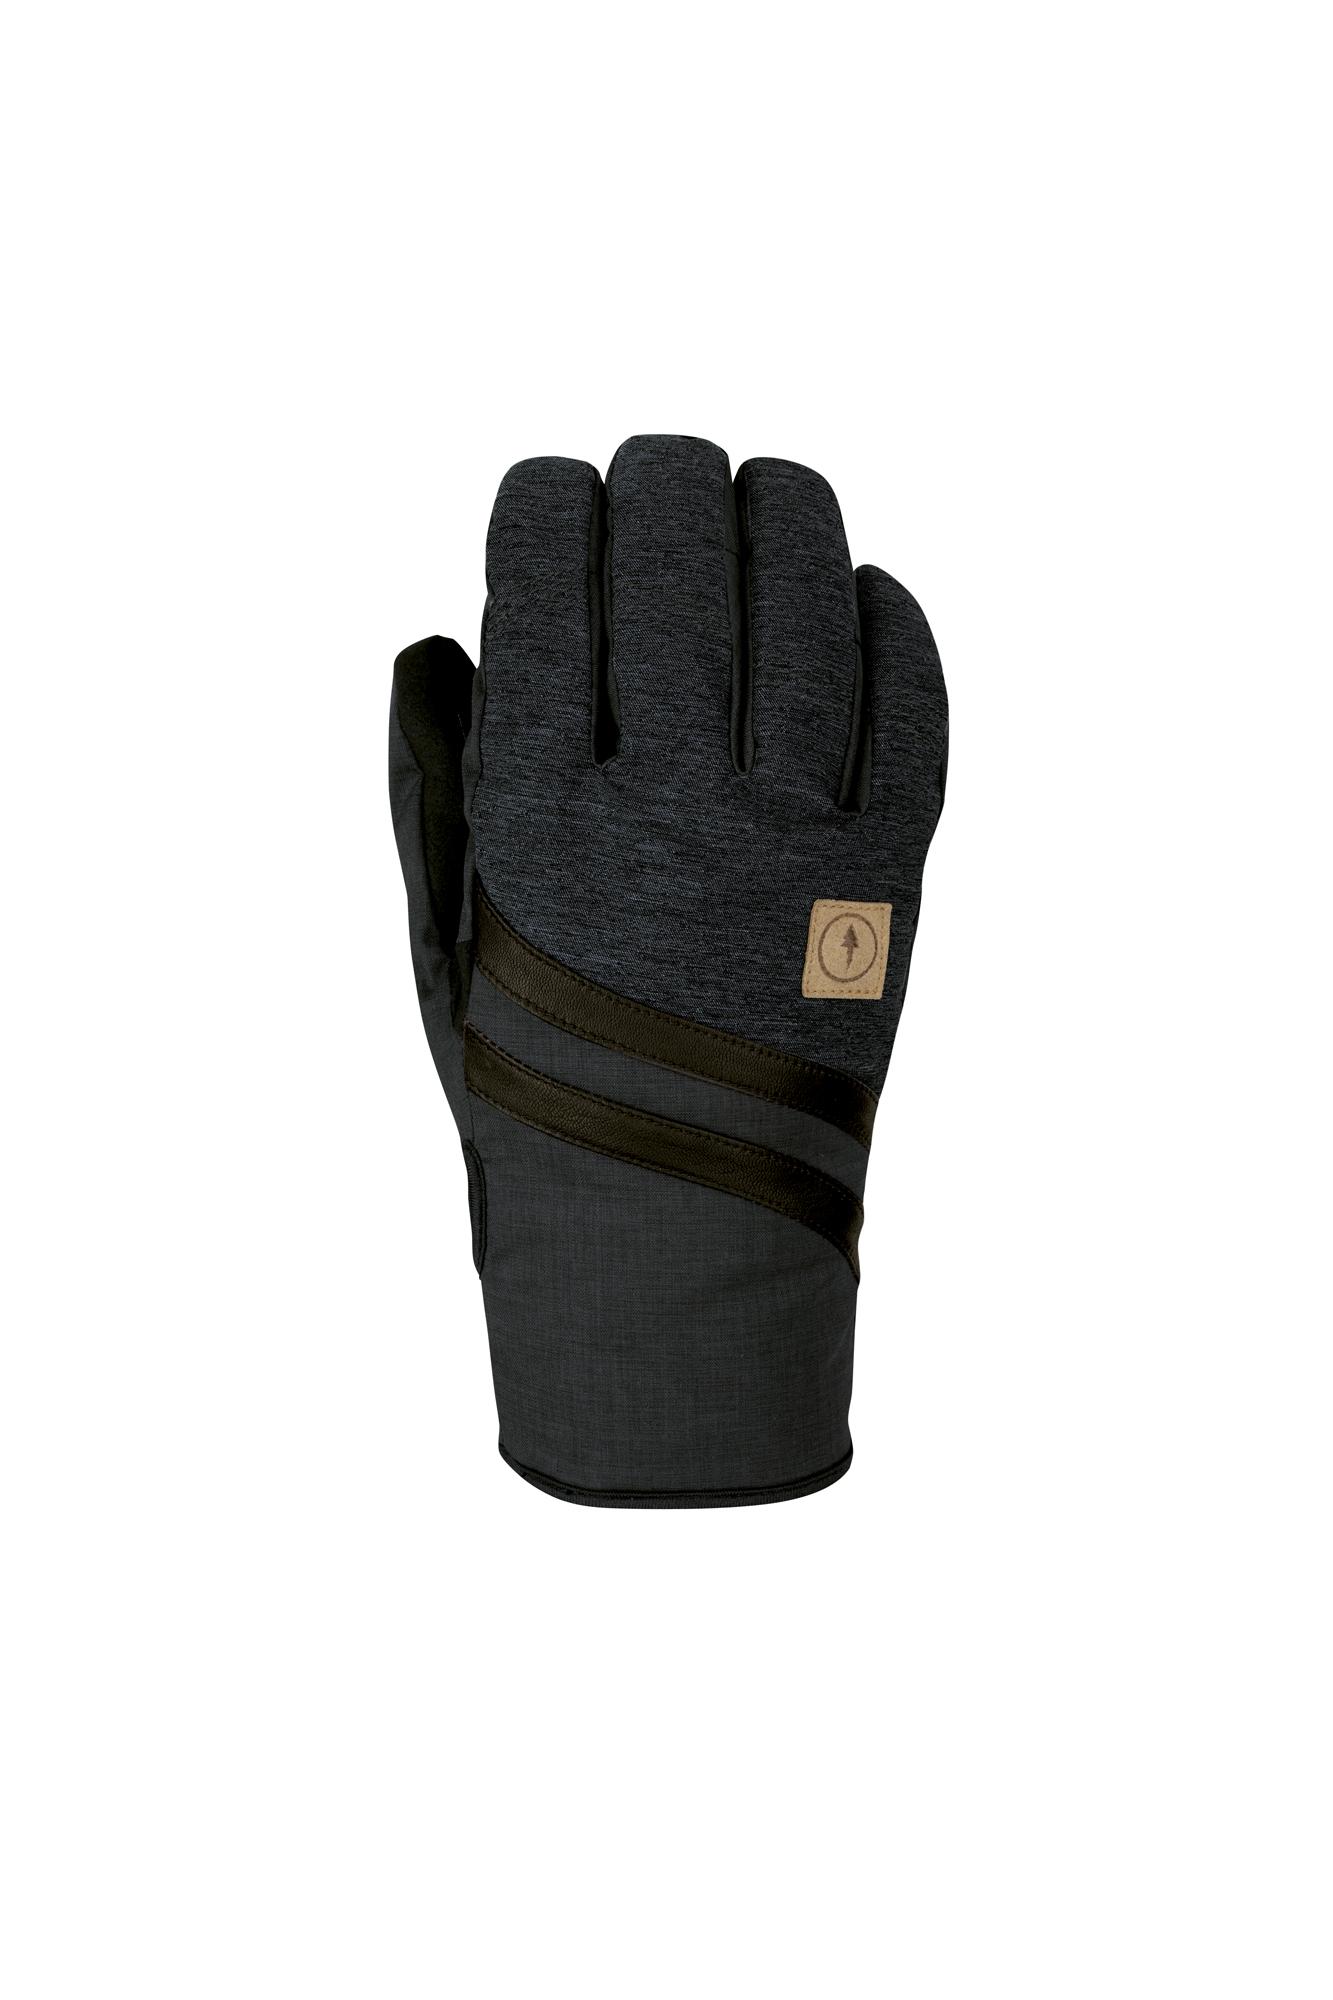 POW Zero Ski Snowboard Glove Drylight Series Black